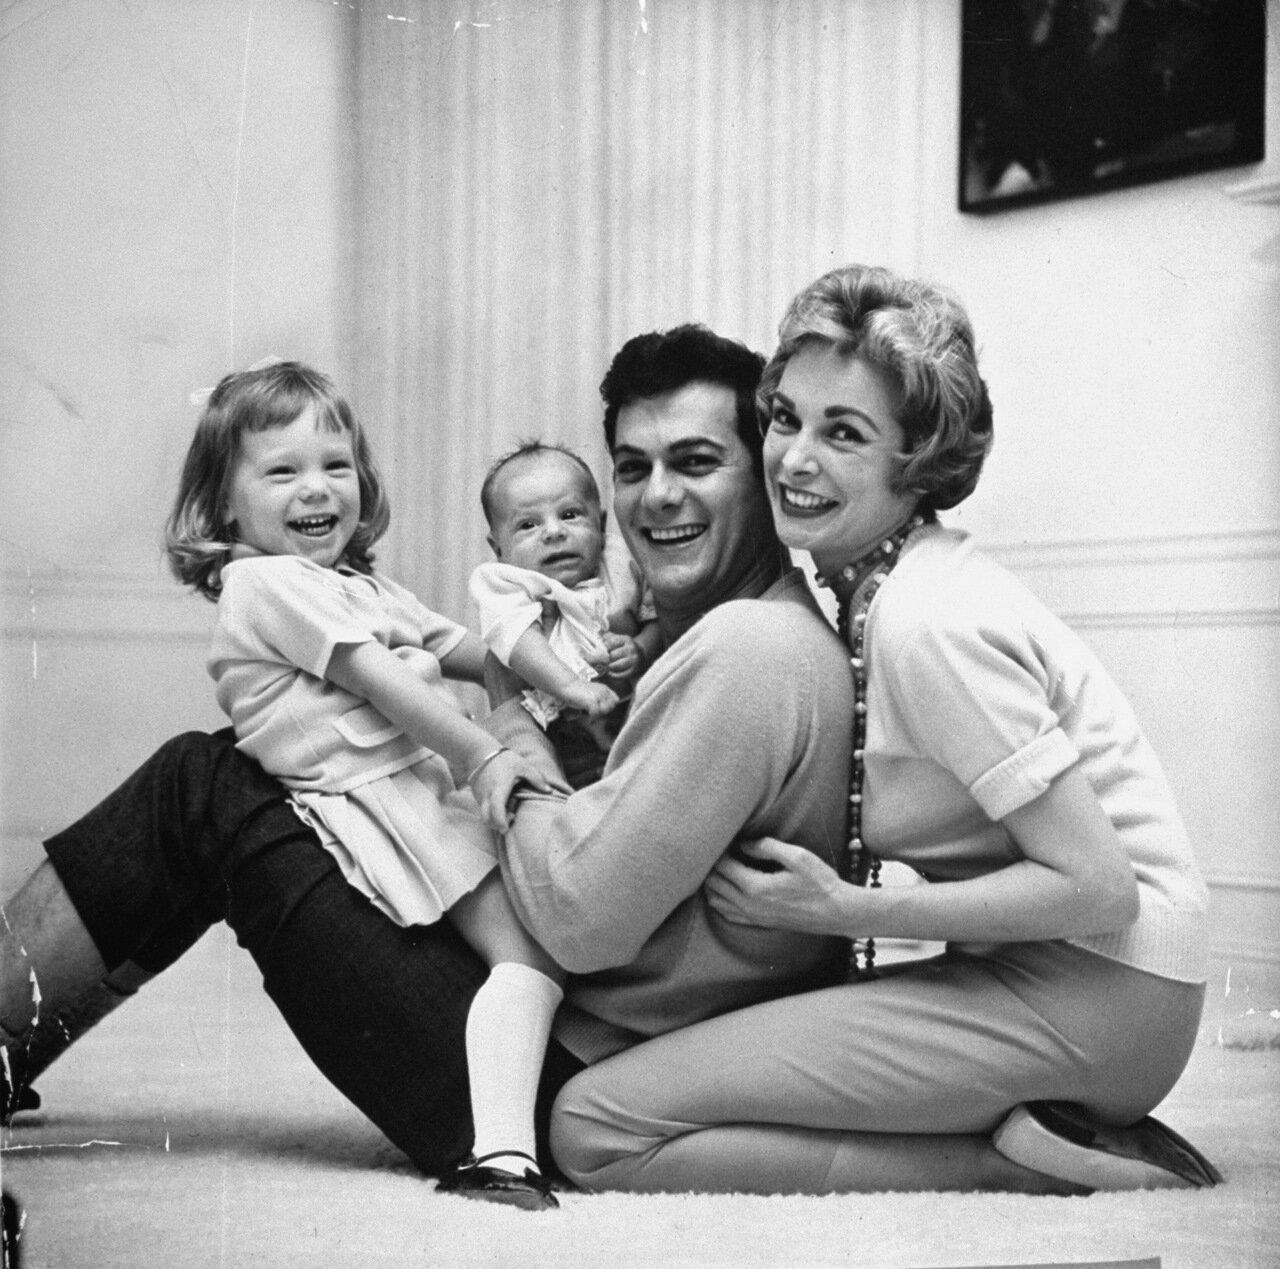 1959. Тони Кертис и Джанет Ли играют со своими дочерьми. Слева будущая актриса телевидения Келли Кертис, справа будущая кинозвезда Джейми Ли Кертис. Беверли-Хиллз